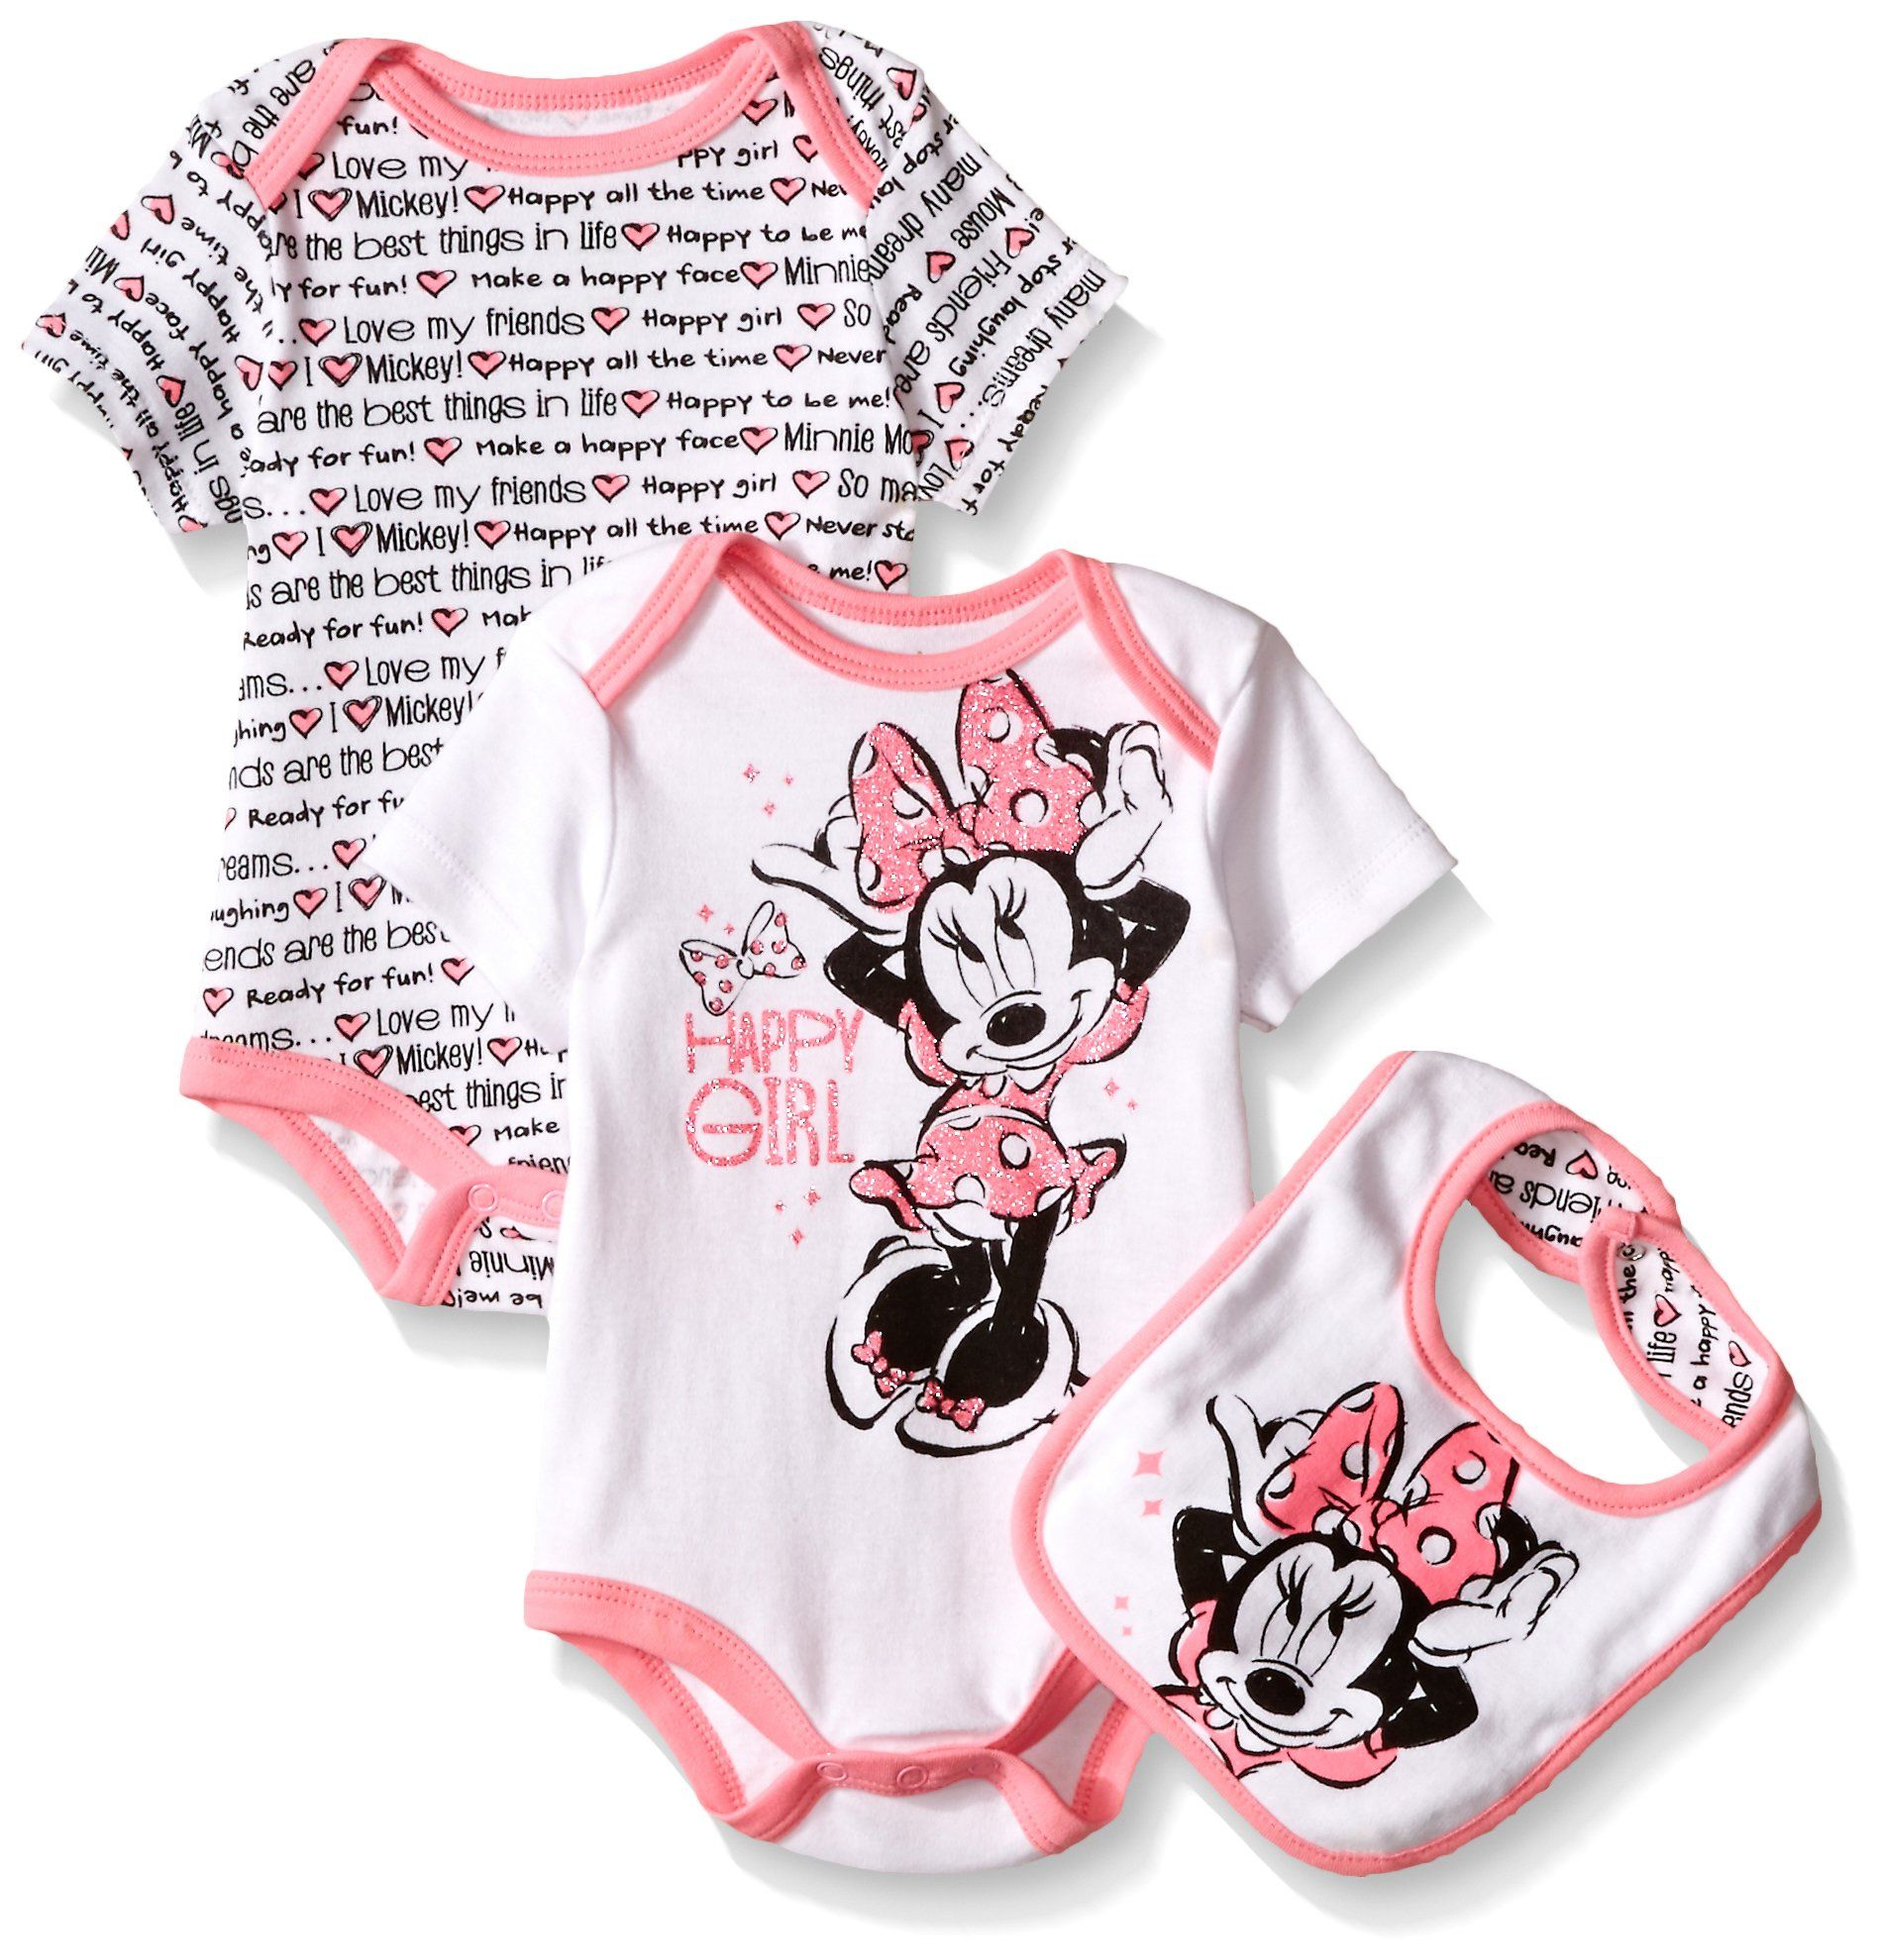 3fb247fd8 Amazon.com: Disney Baby Girls' Minnie Mouse 2 Pack Bodysuit with Bib:  Clothing